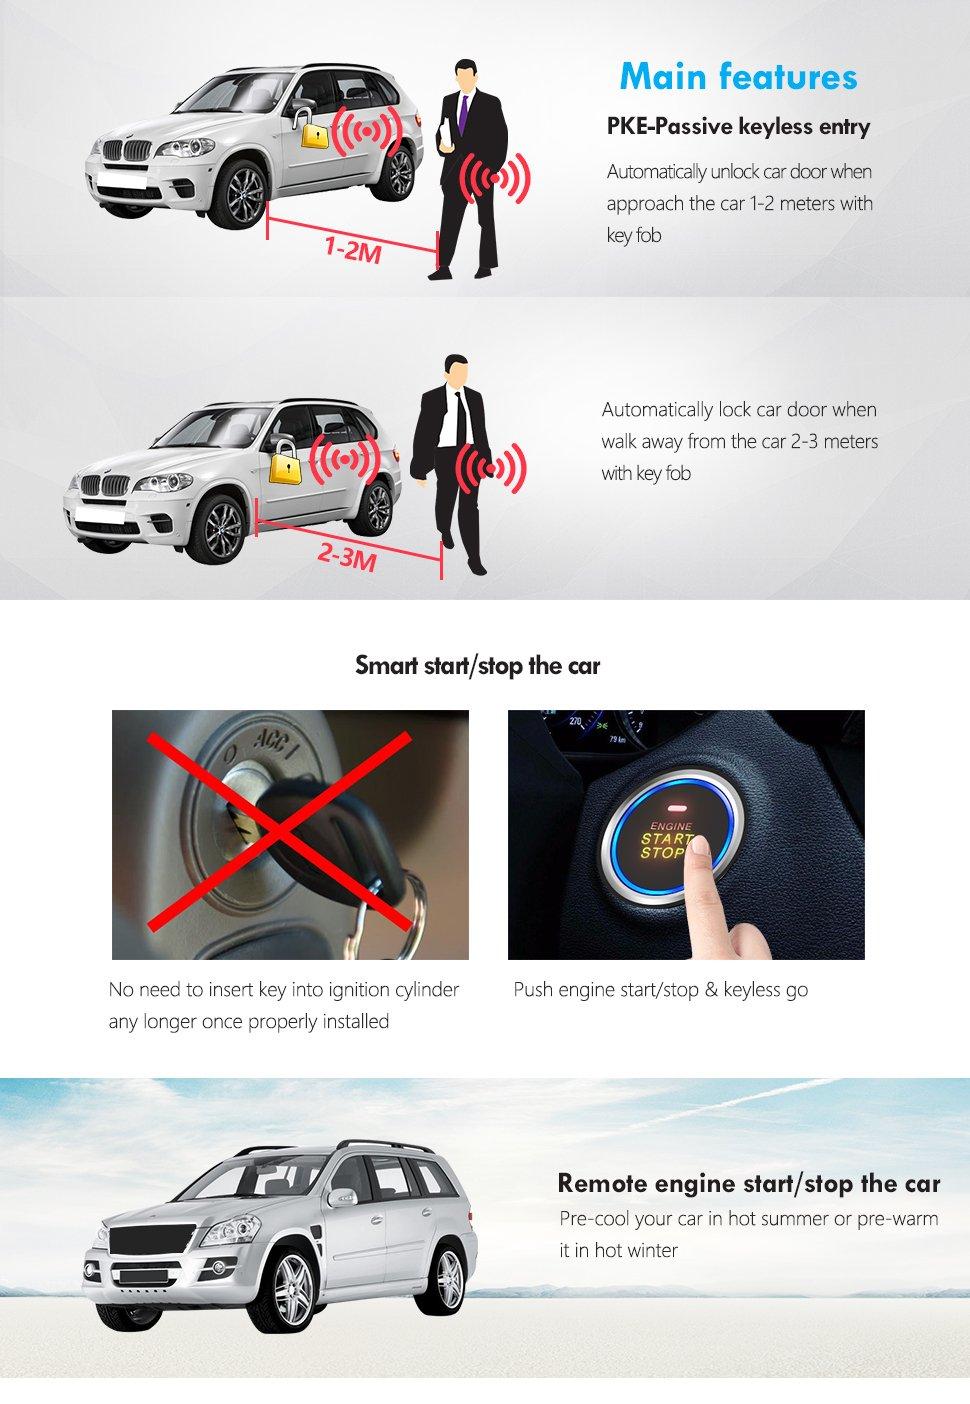 Amazon.com: EASYGUARD EC003 Smart Key PKE Passive Keyless Entry Car ...